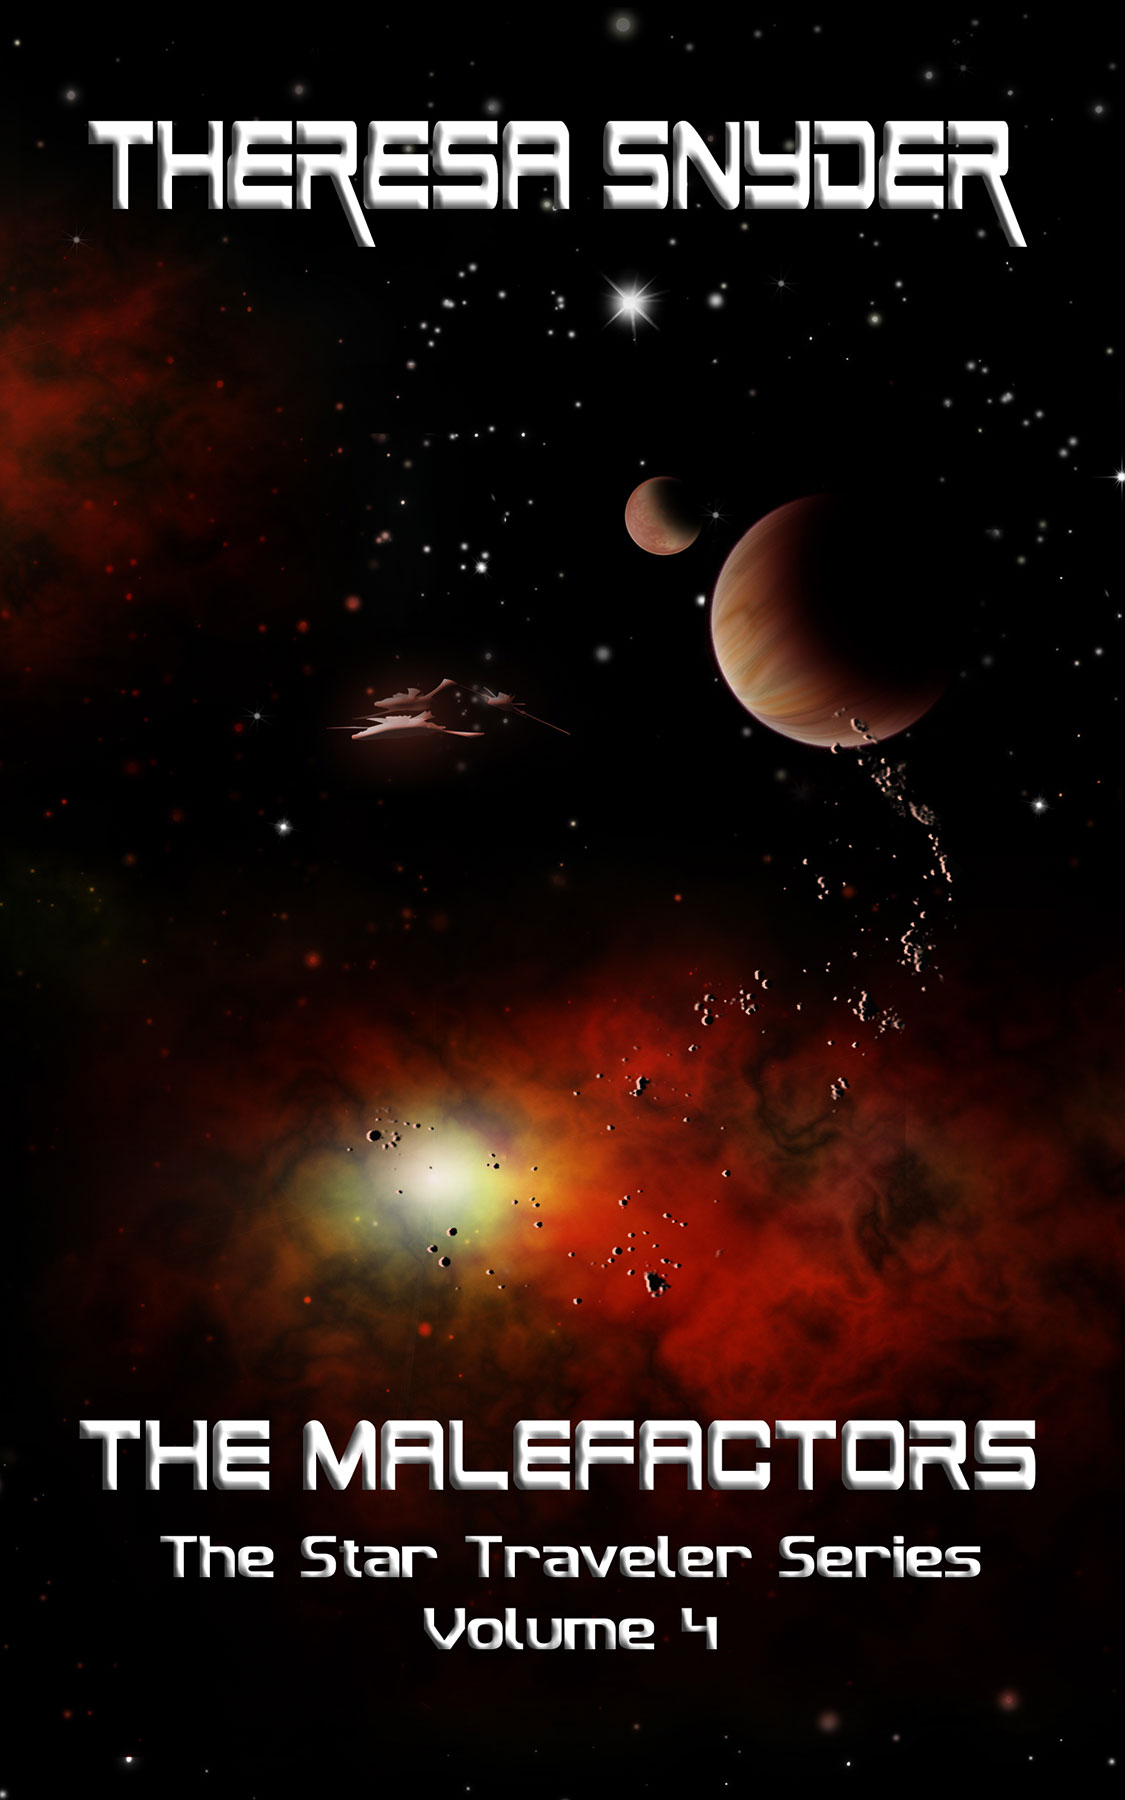 The Malefactors